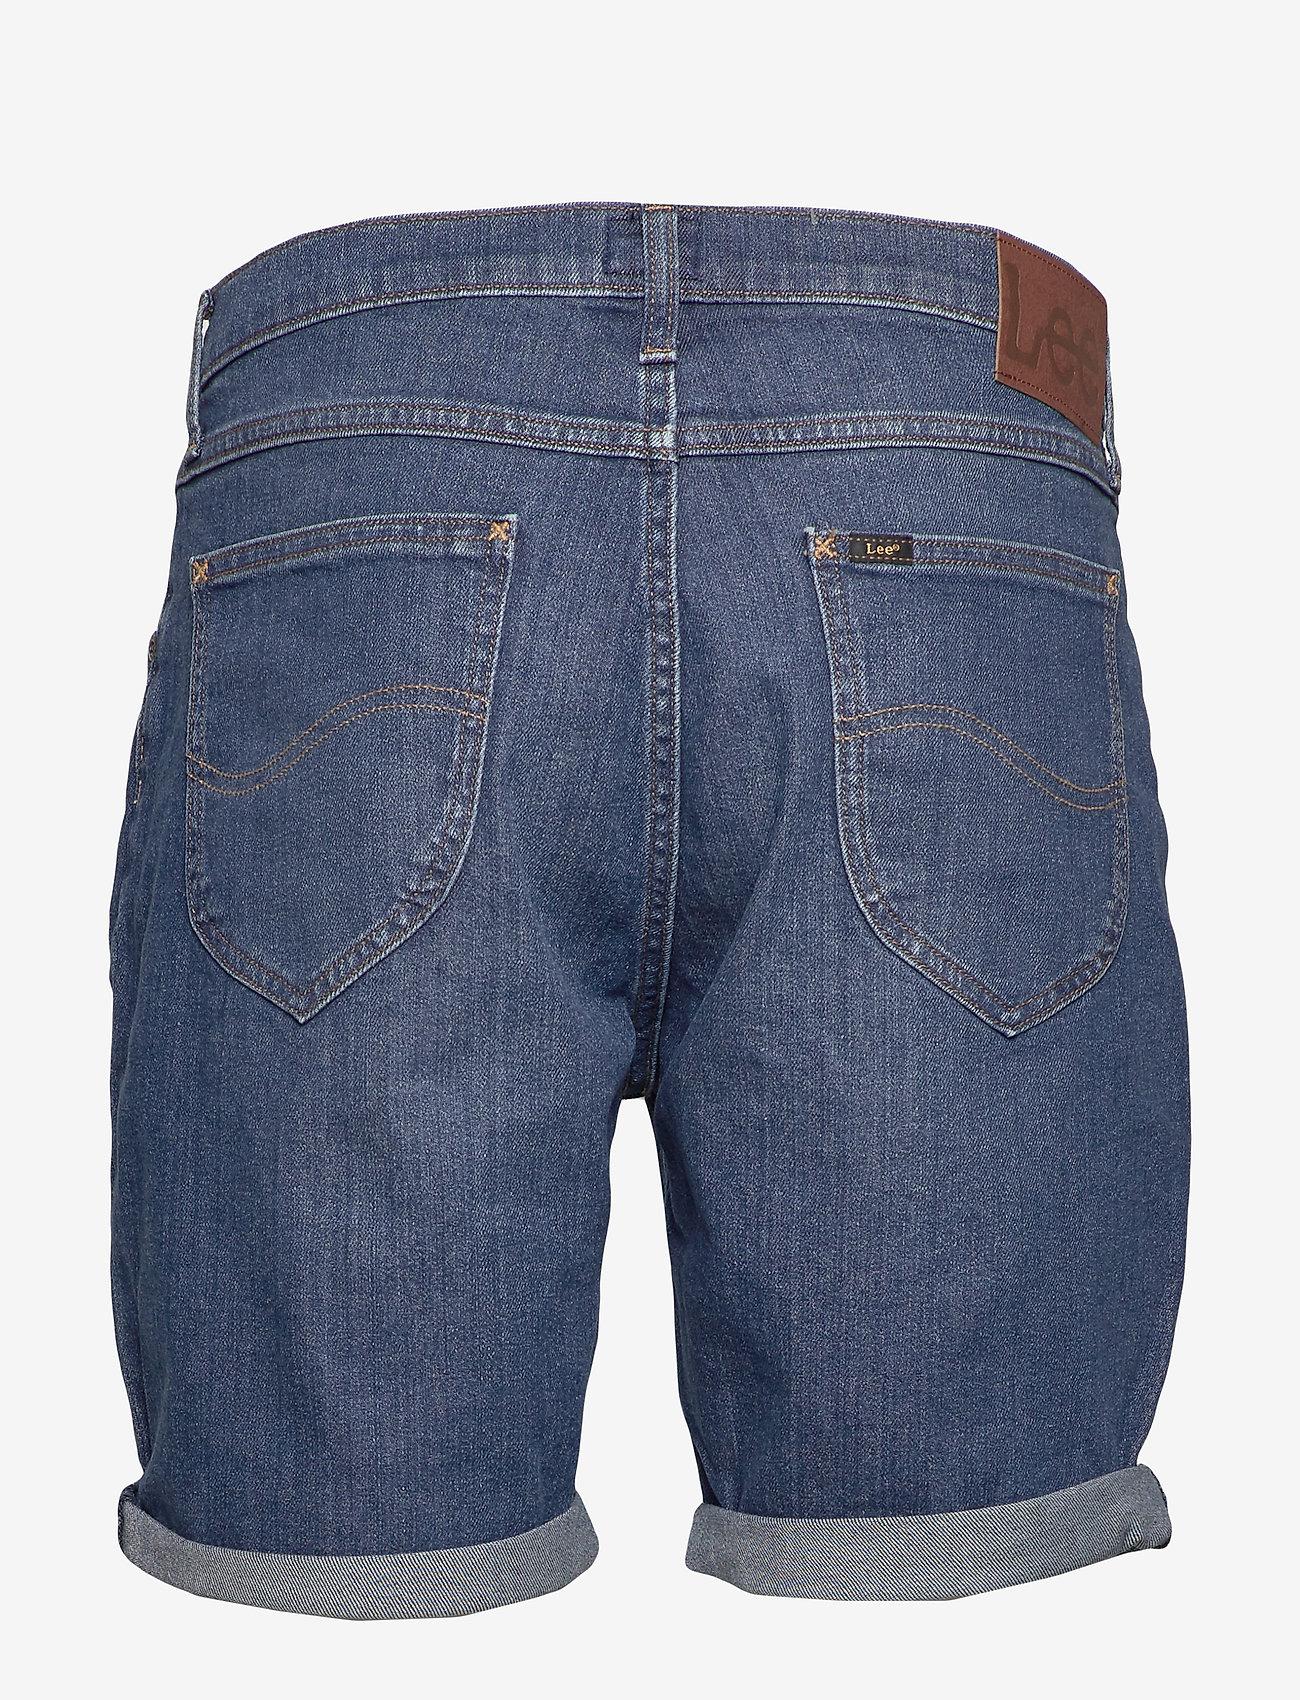 Lee Jeans - RIDER SHORT - denim shorts - hawaii dark - 1